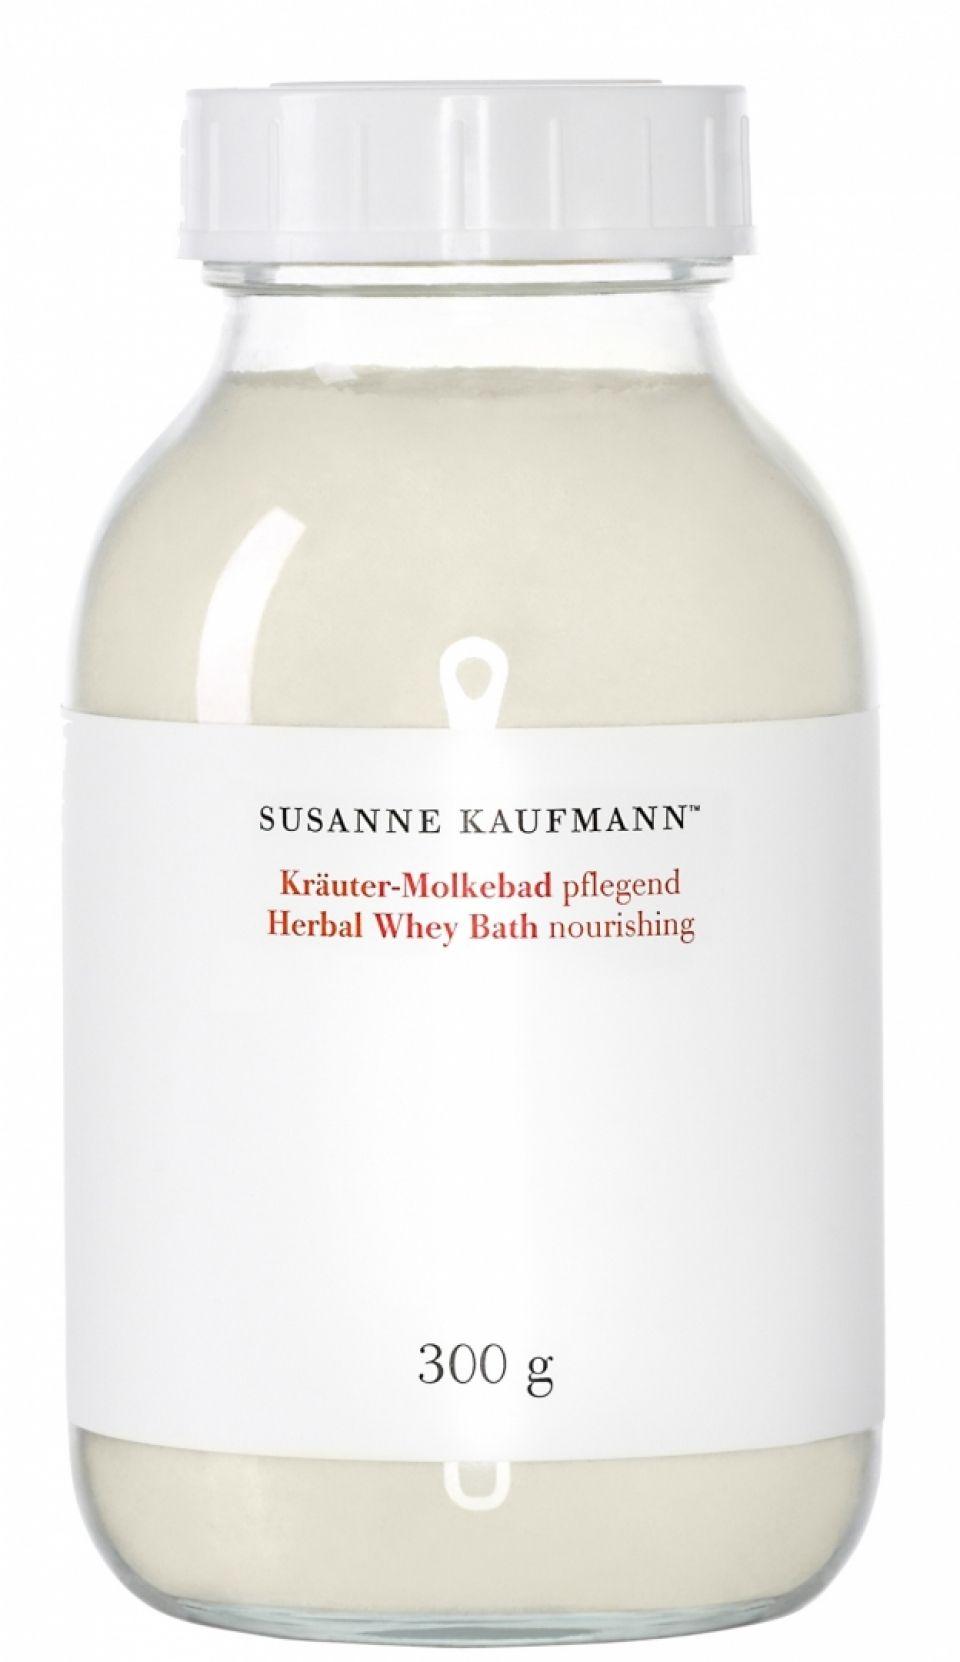 Herbal Whey Bath nourishing - Susanne Kaufmann organic treats